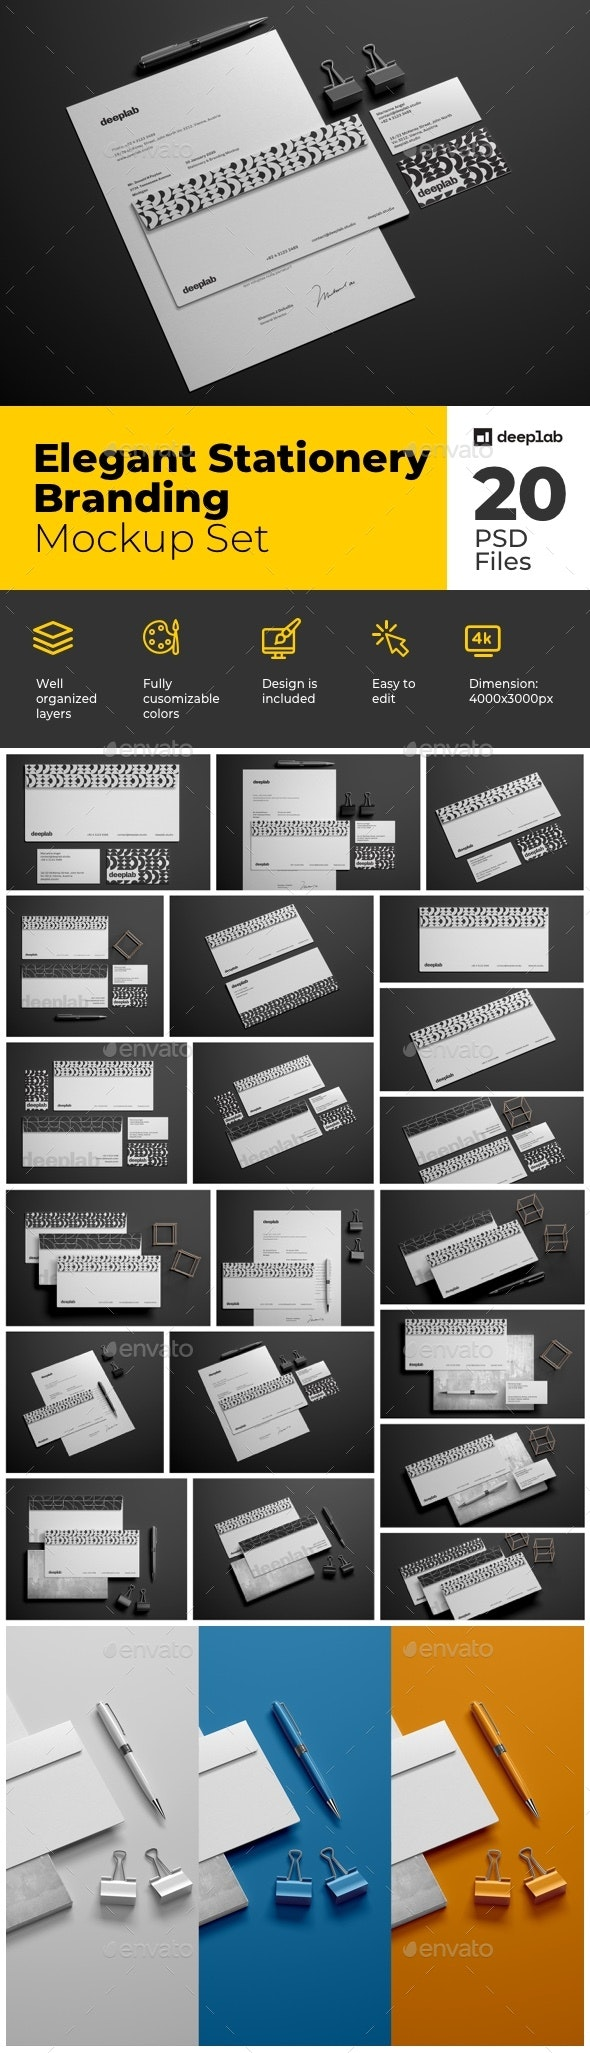 Envelope Branding Mockup Set - Product Mock-Ups Graphics